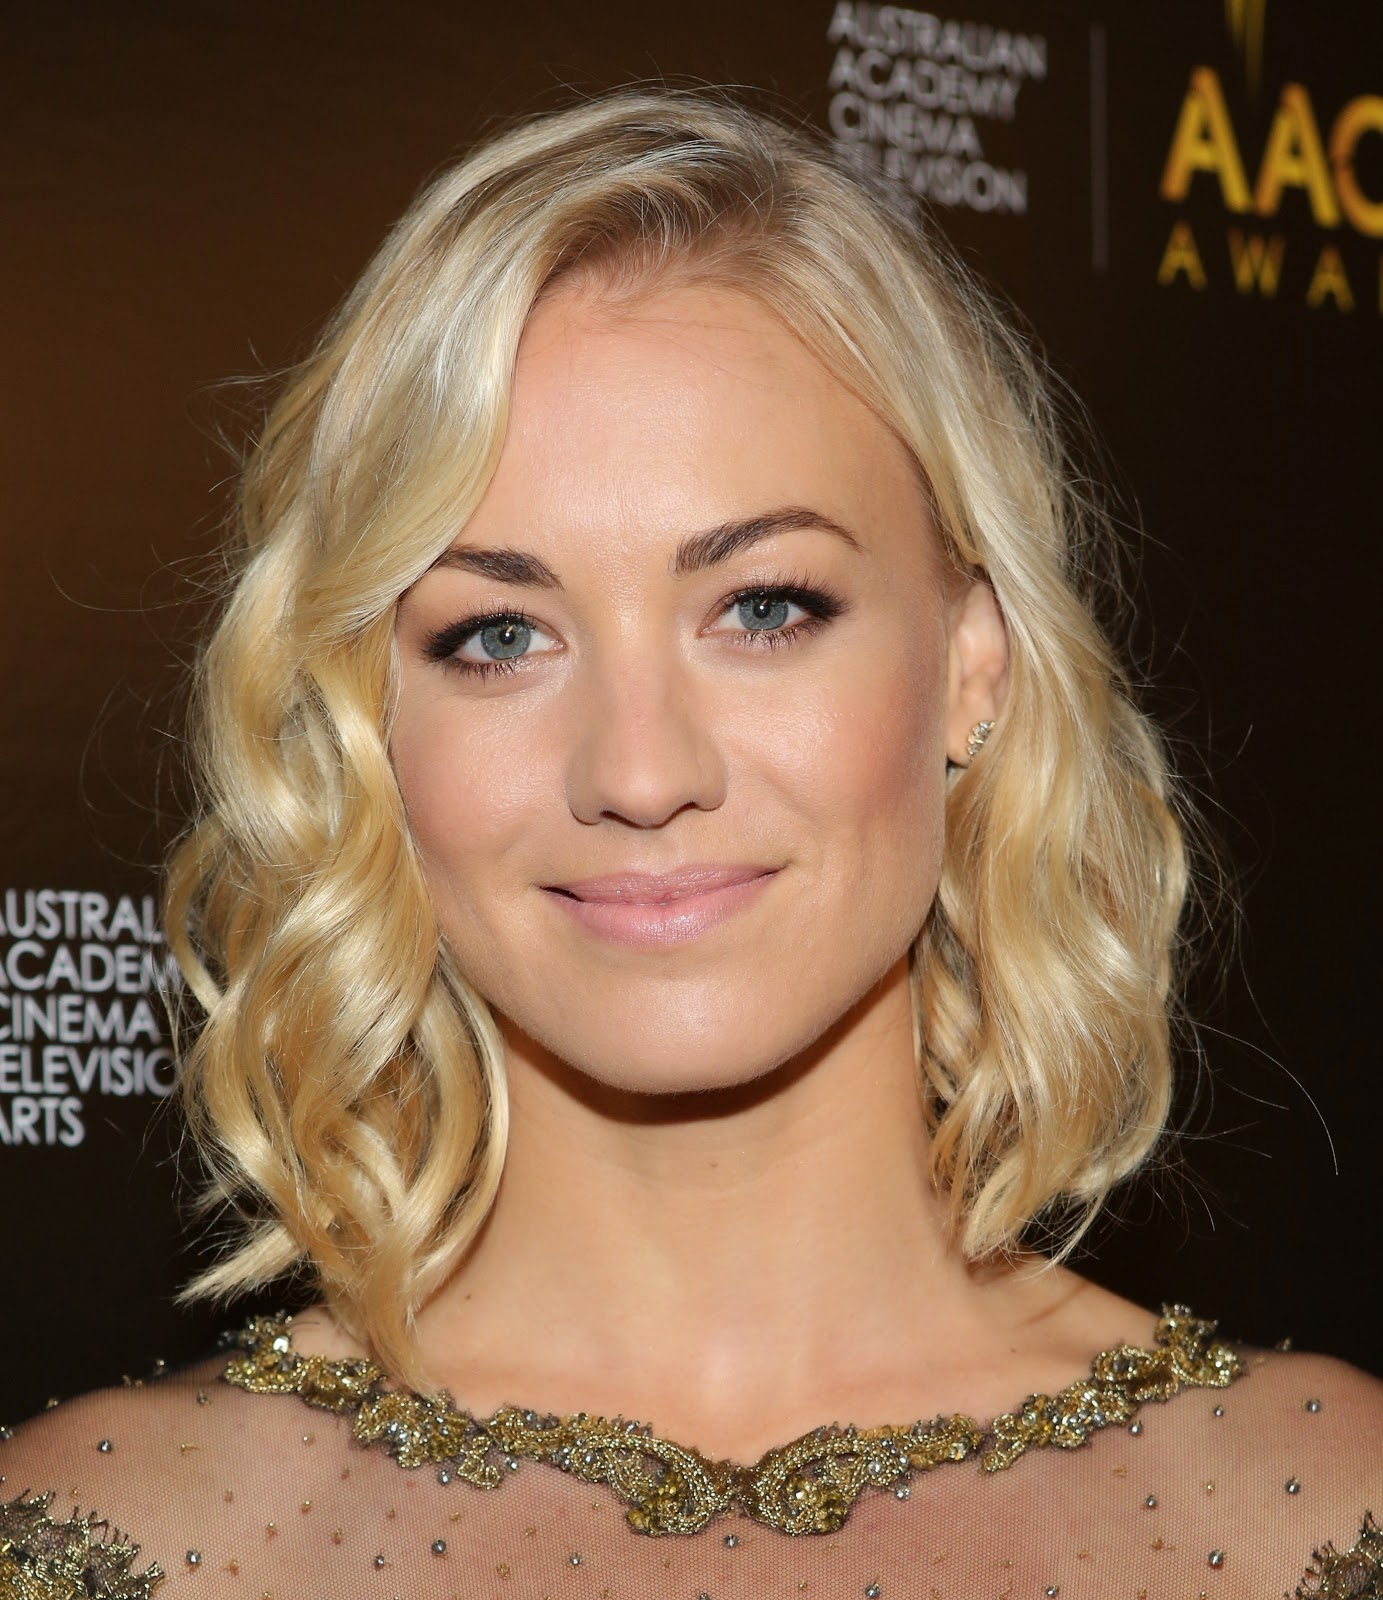 australian actress yvonne strahovski hd pictures amp profile